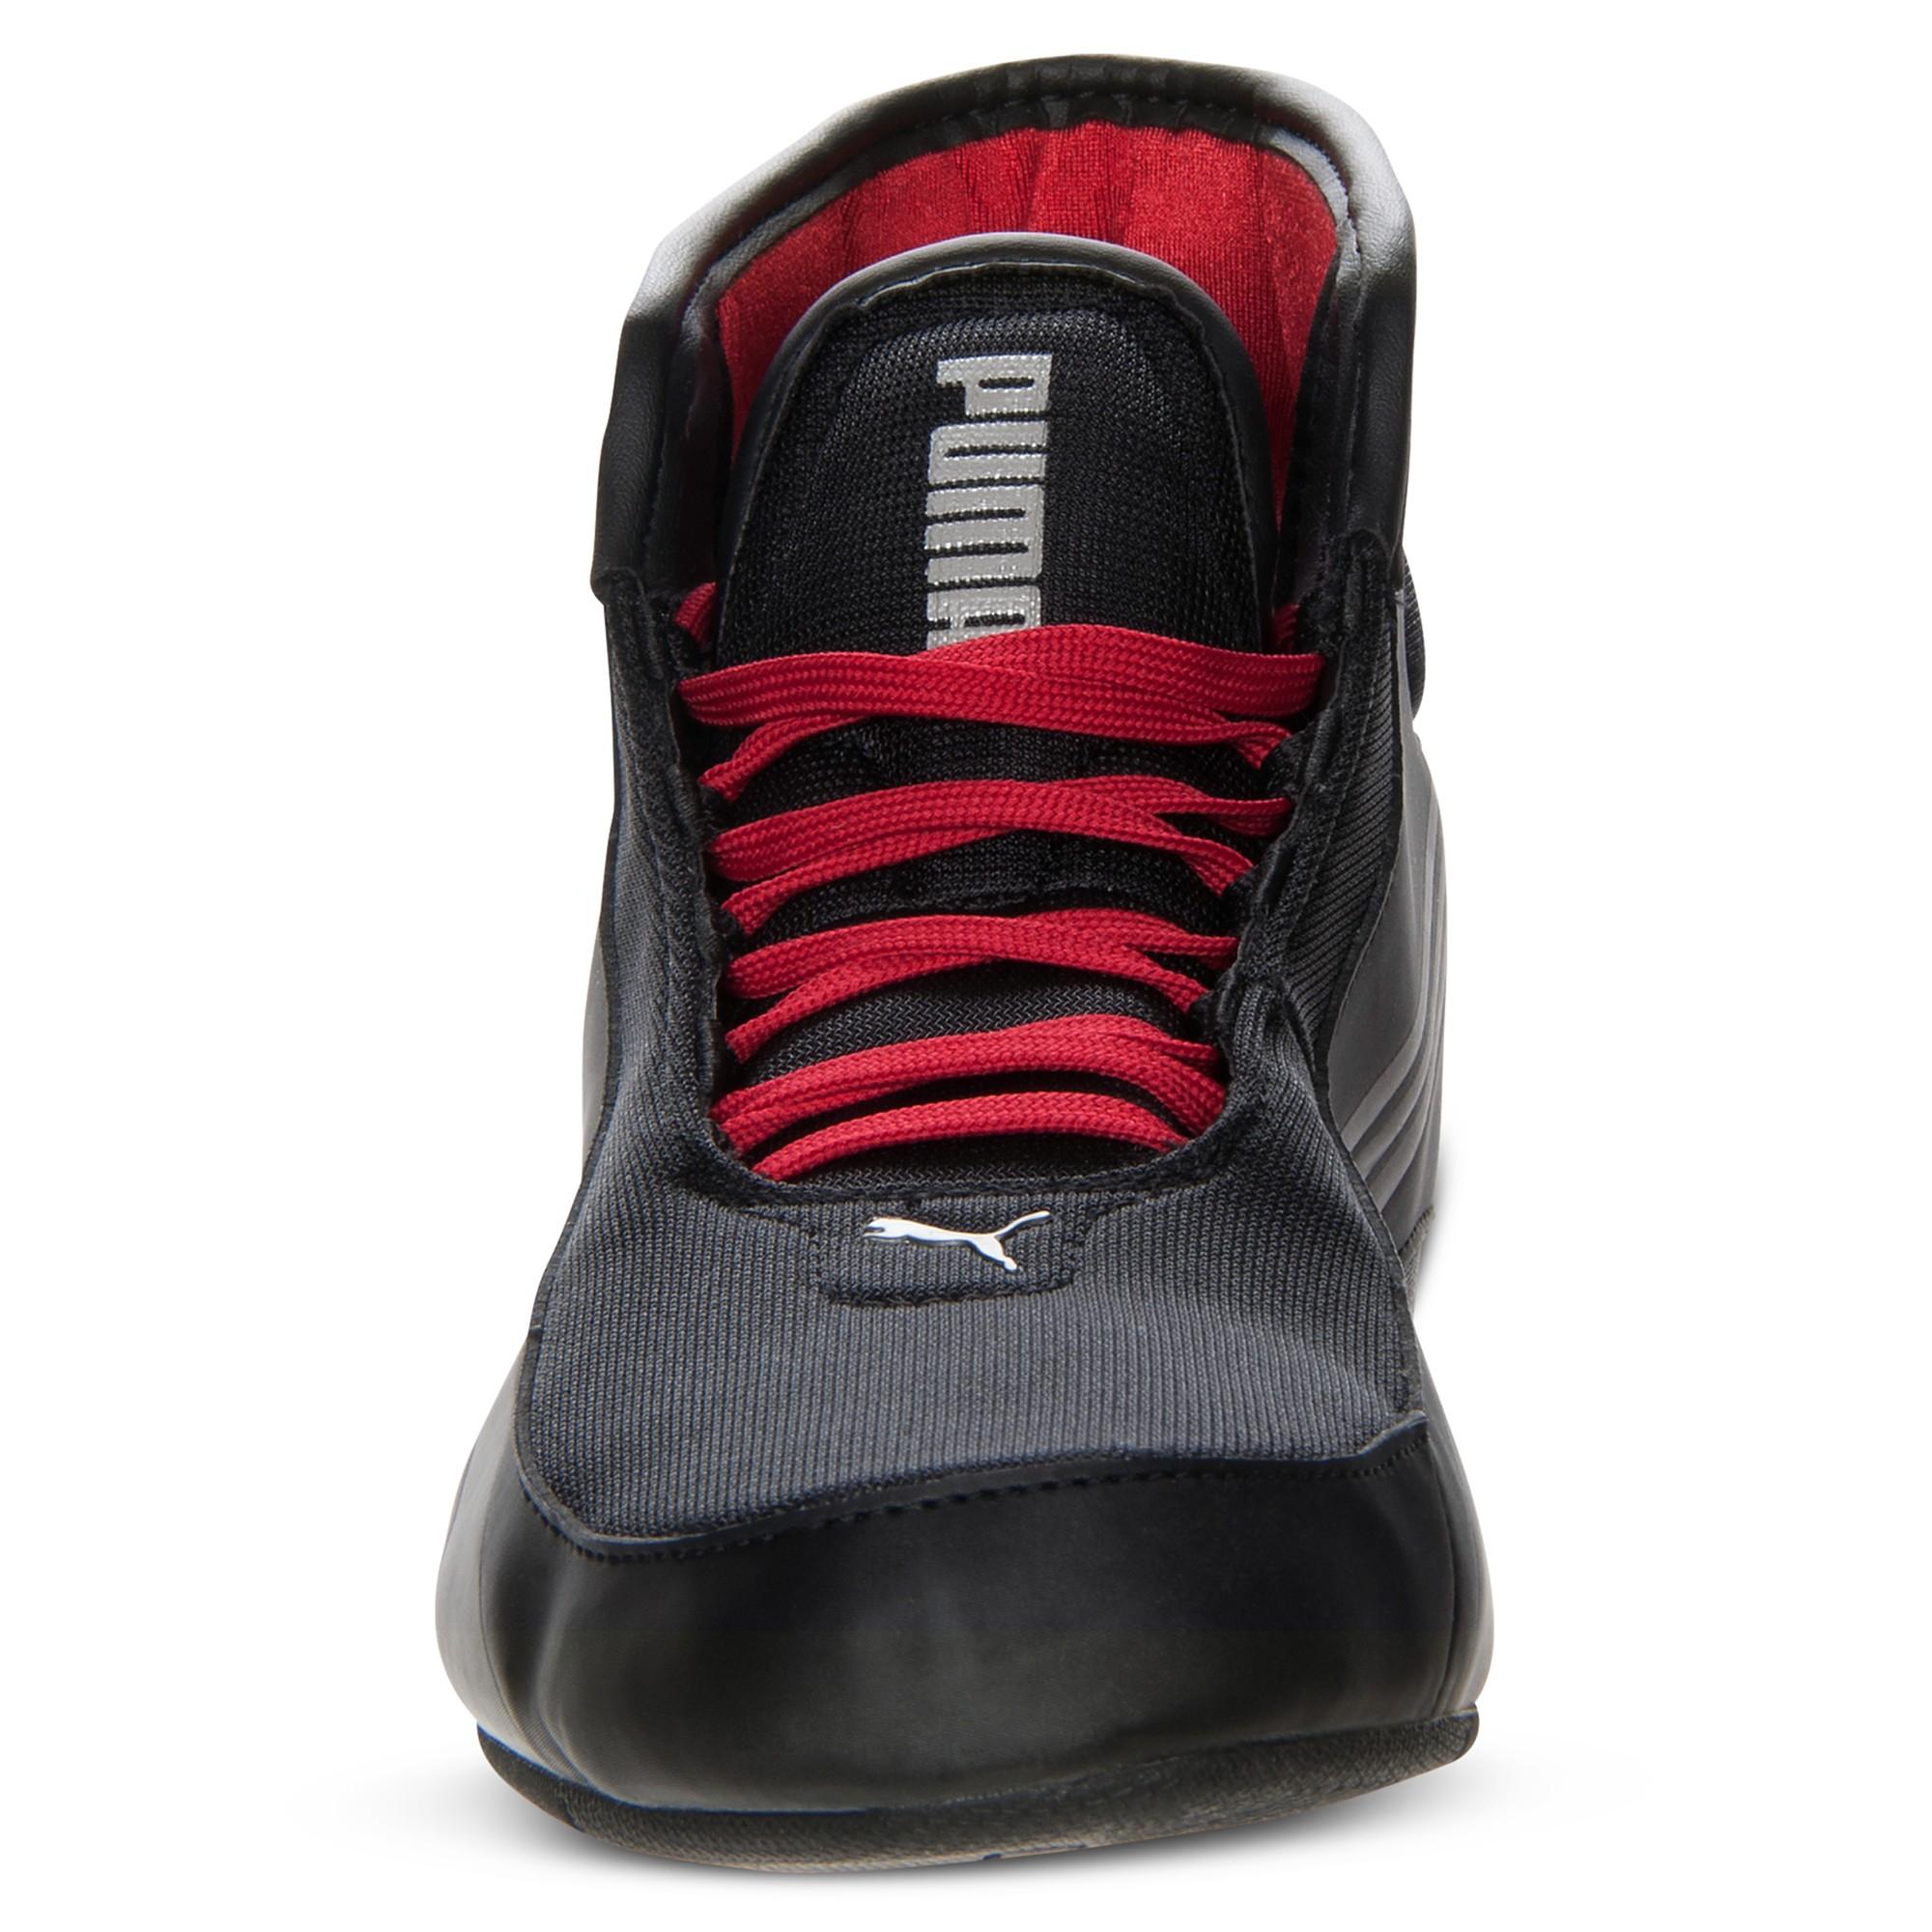 PUMA Alekto Mid Sf Sneakers in Black